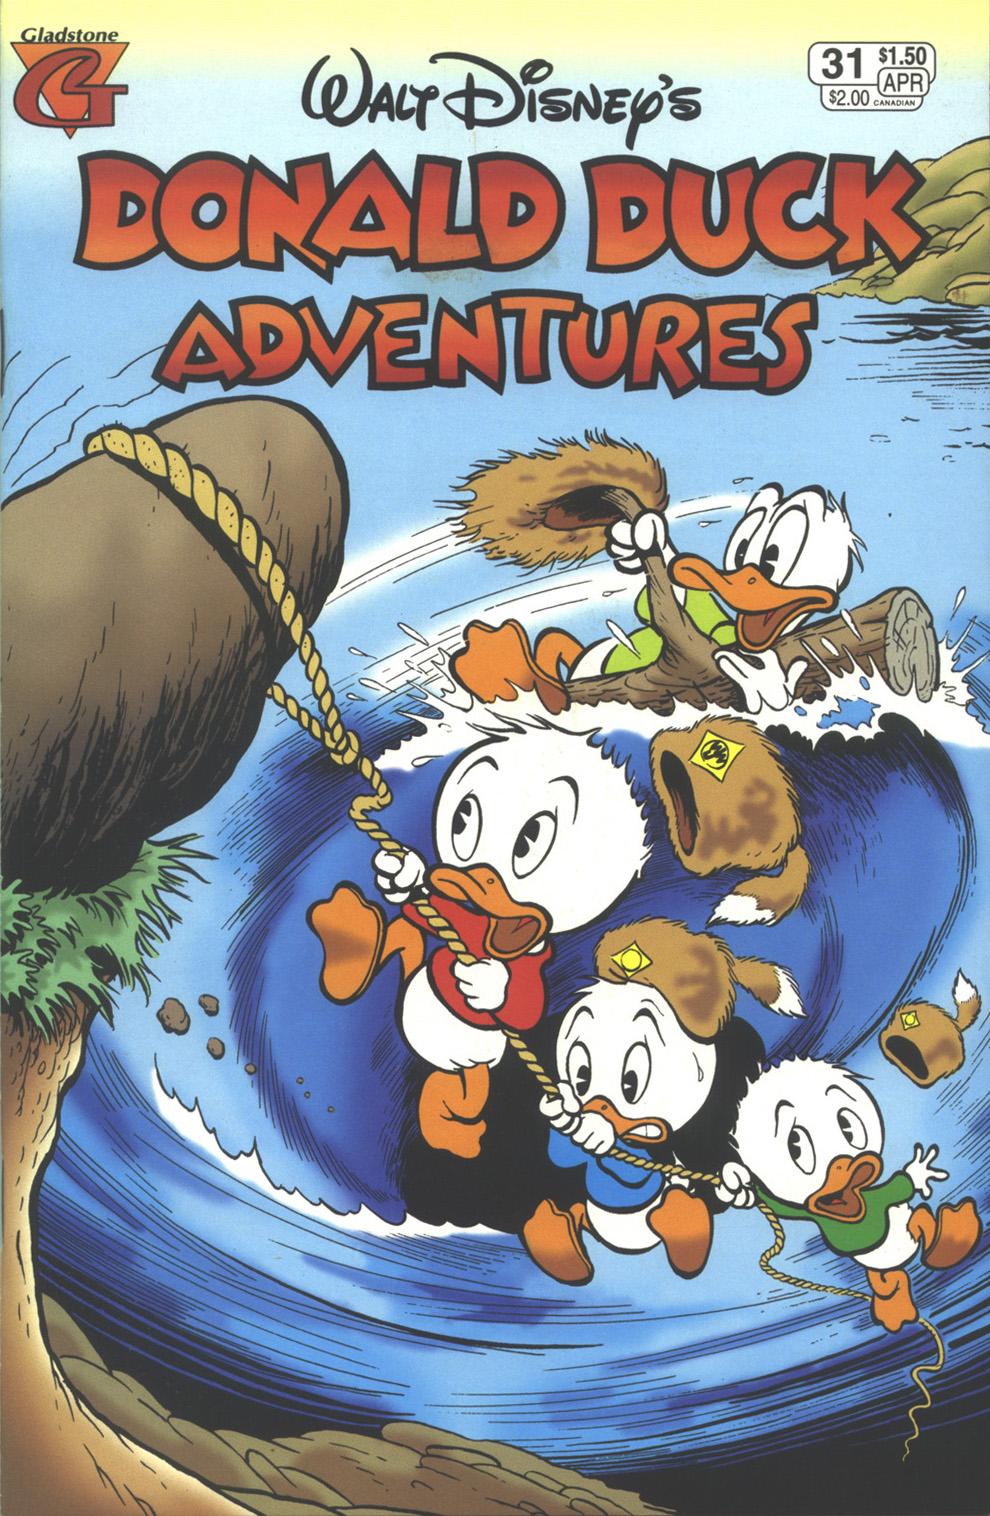 Walt Disney's Donald Duck Adventures (1987) issue 31 - Page 1